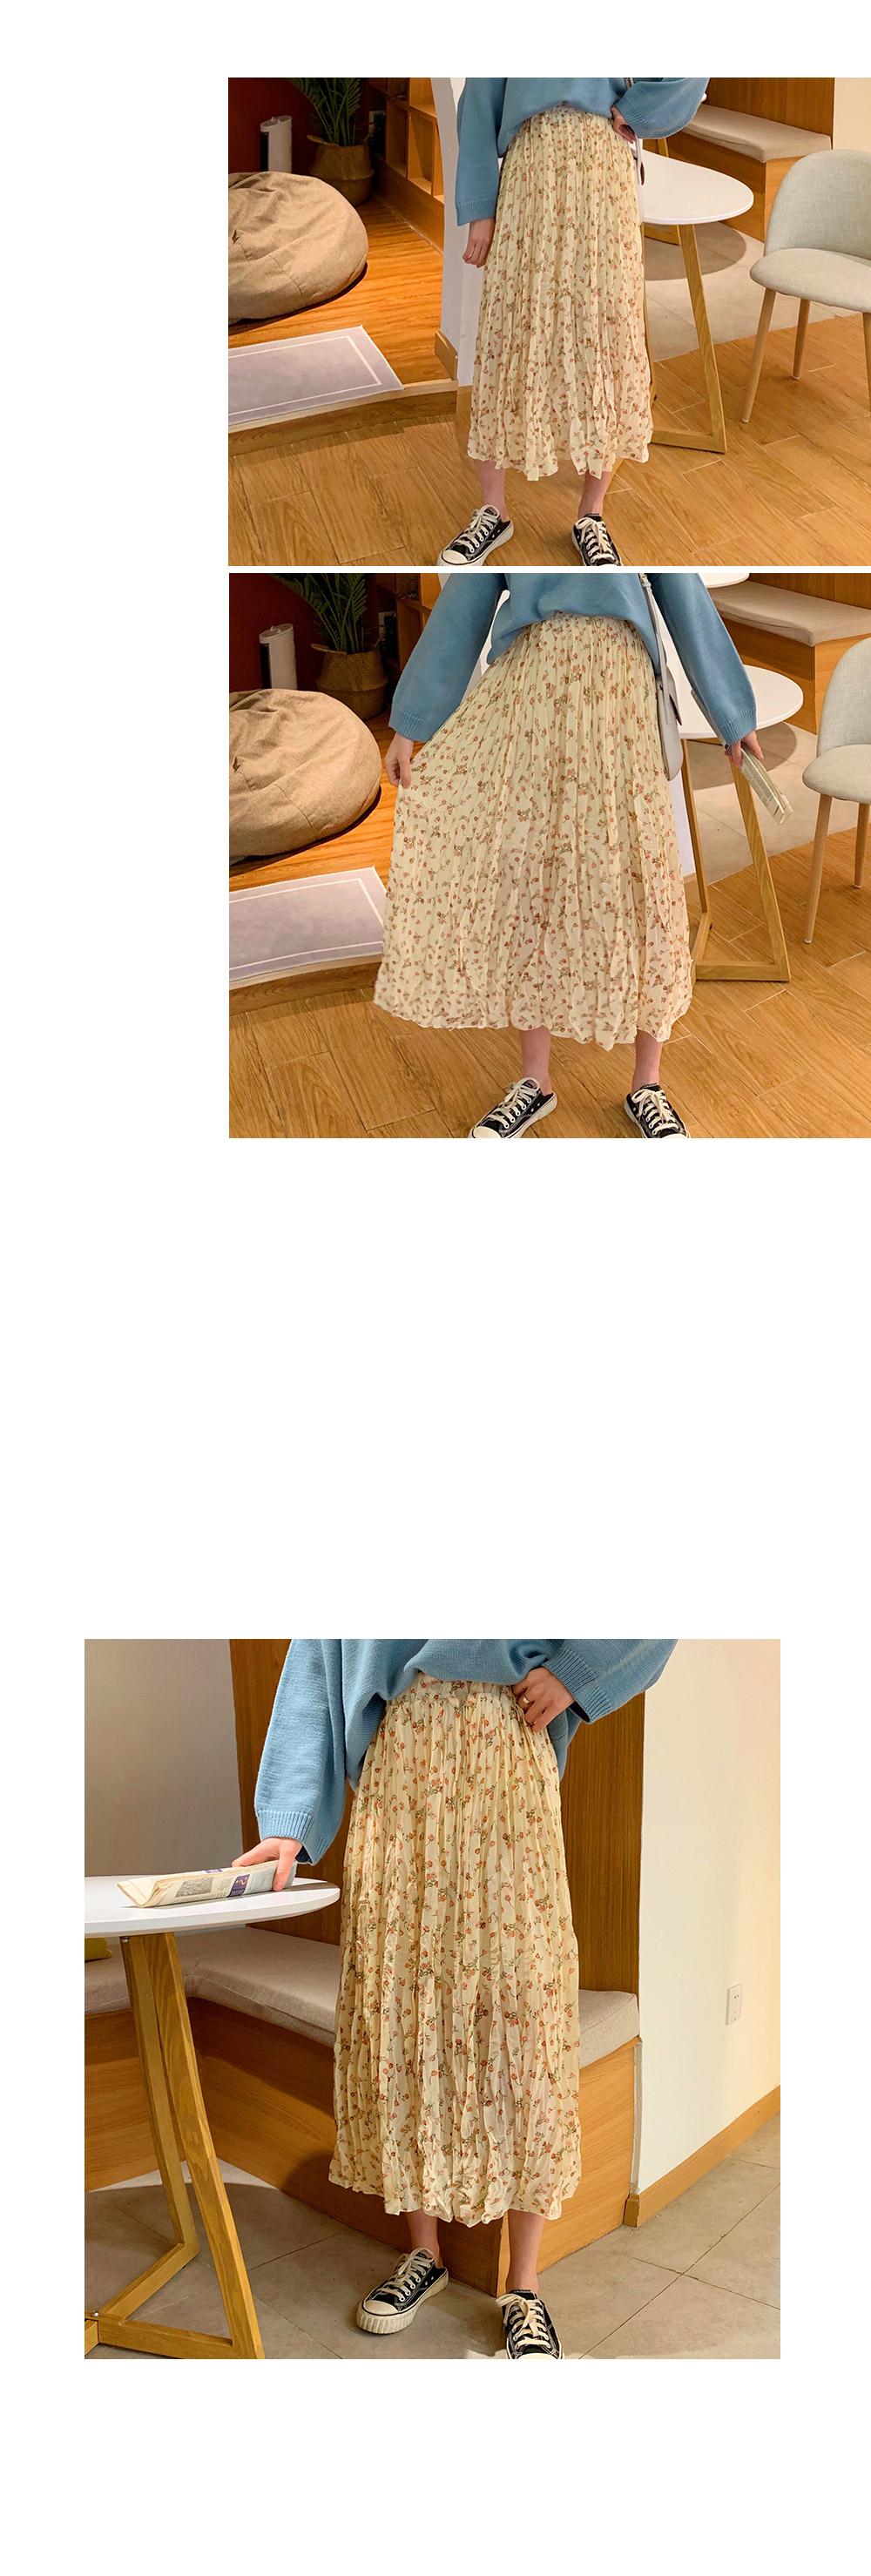 Darling flower wrinkle skirt